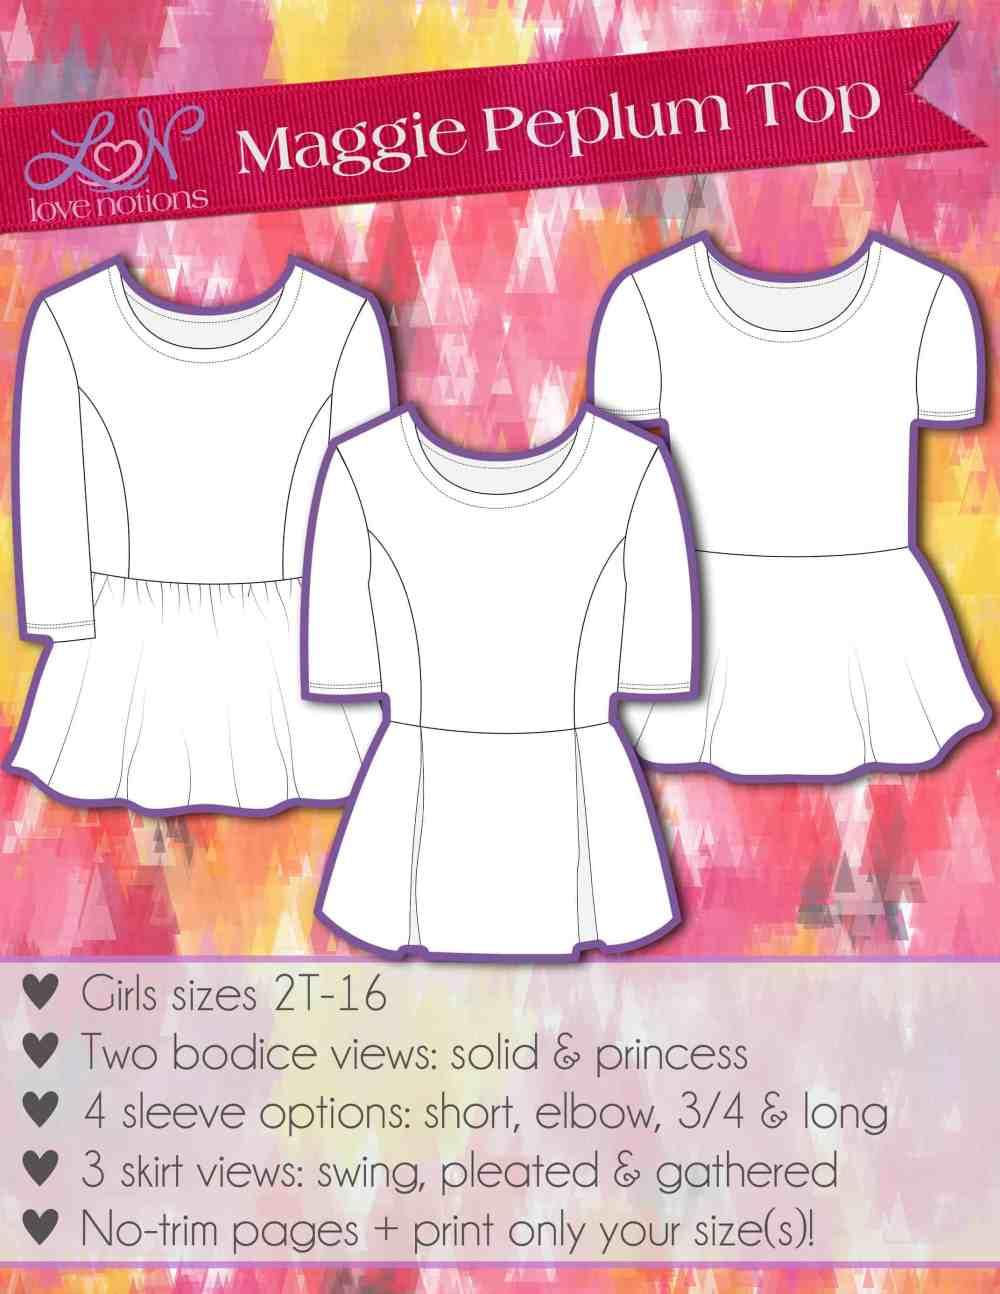 Girls peplum sewing pattern by Love Notions